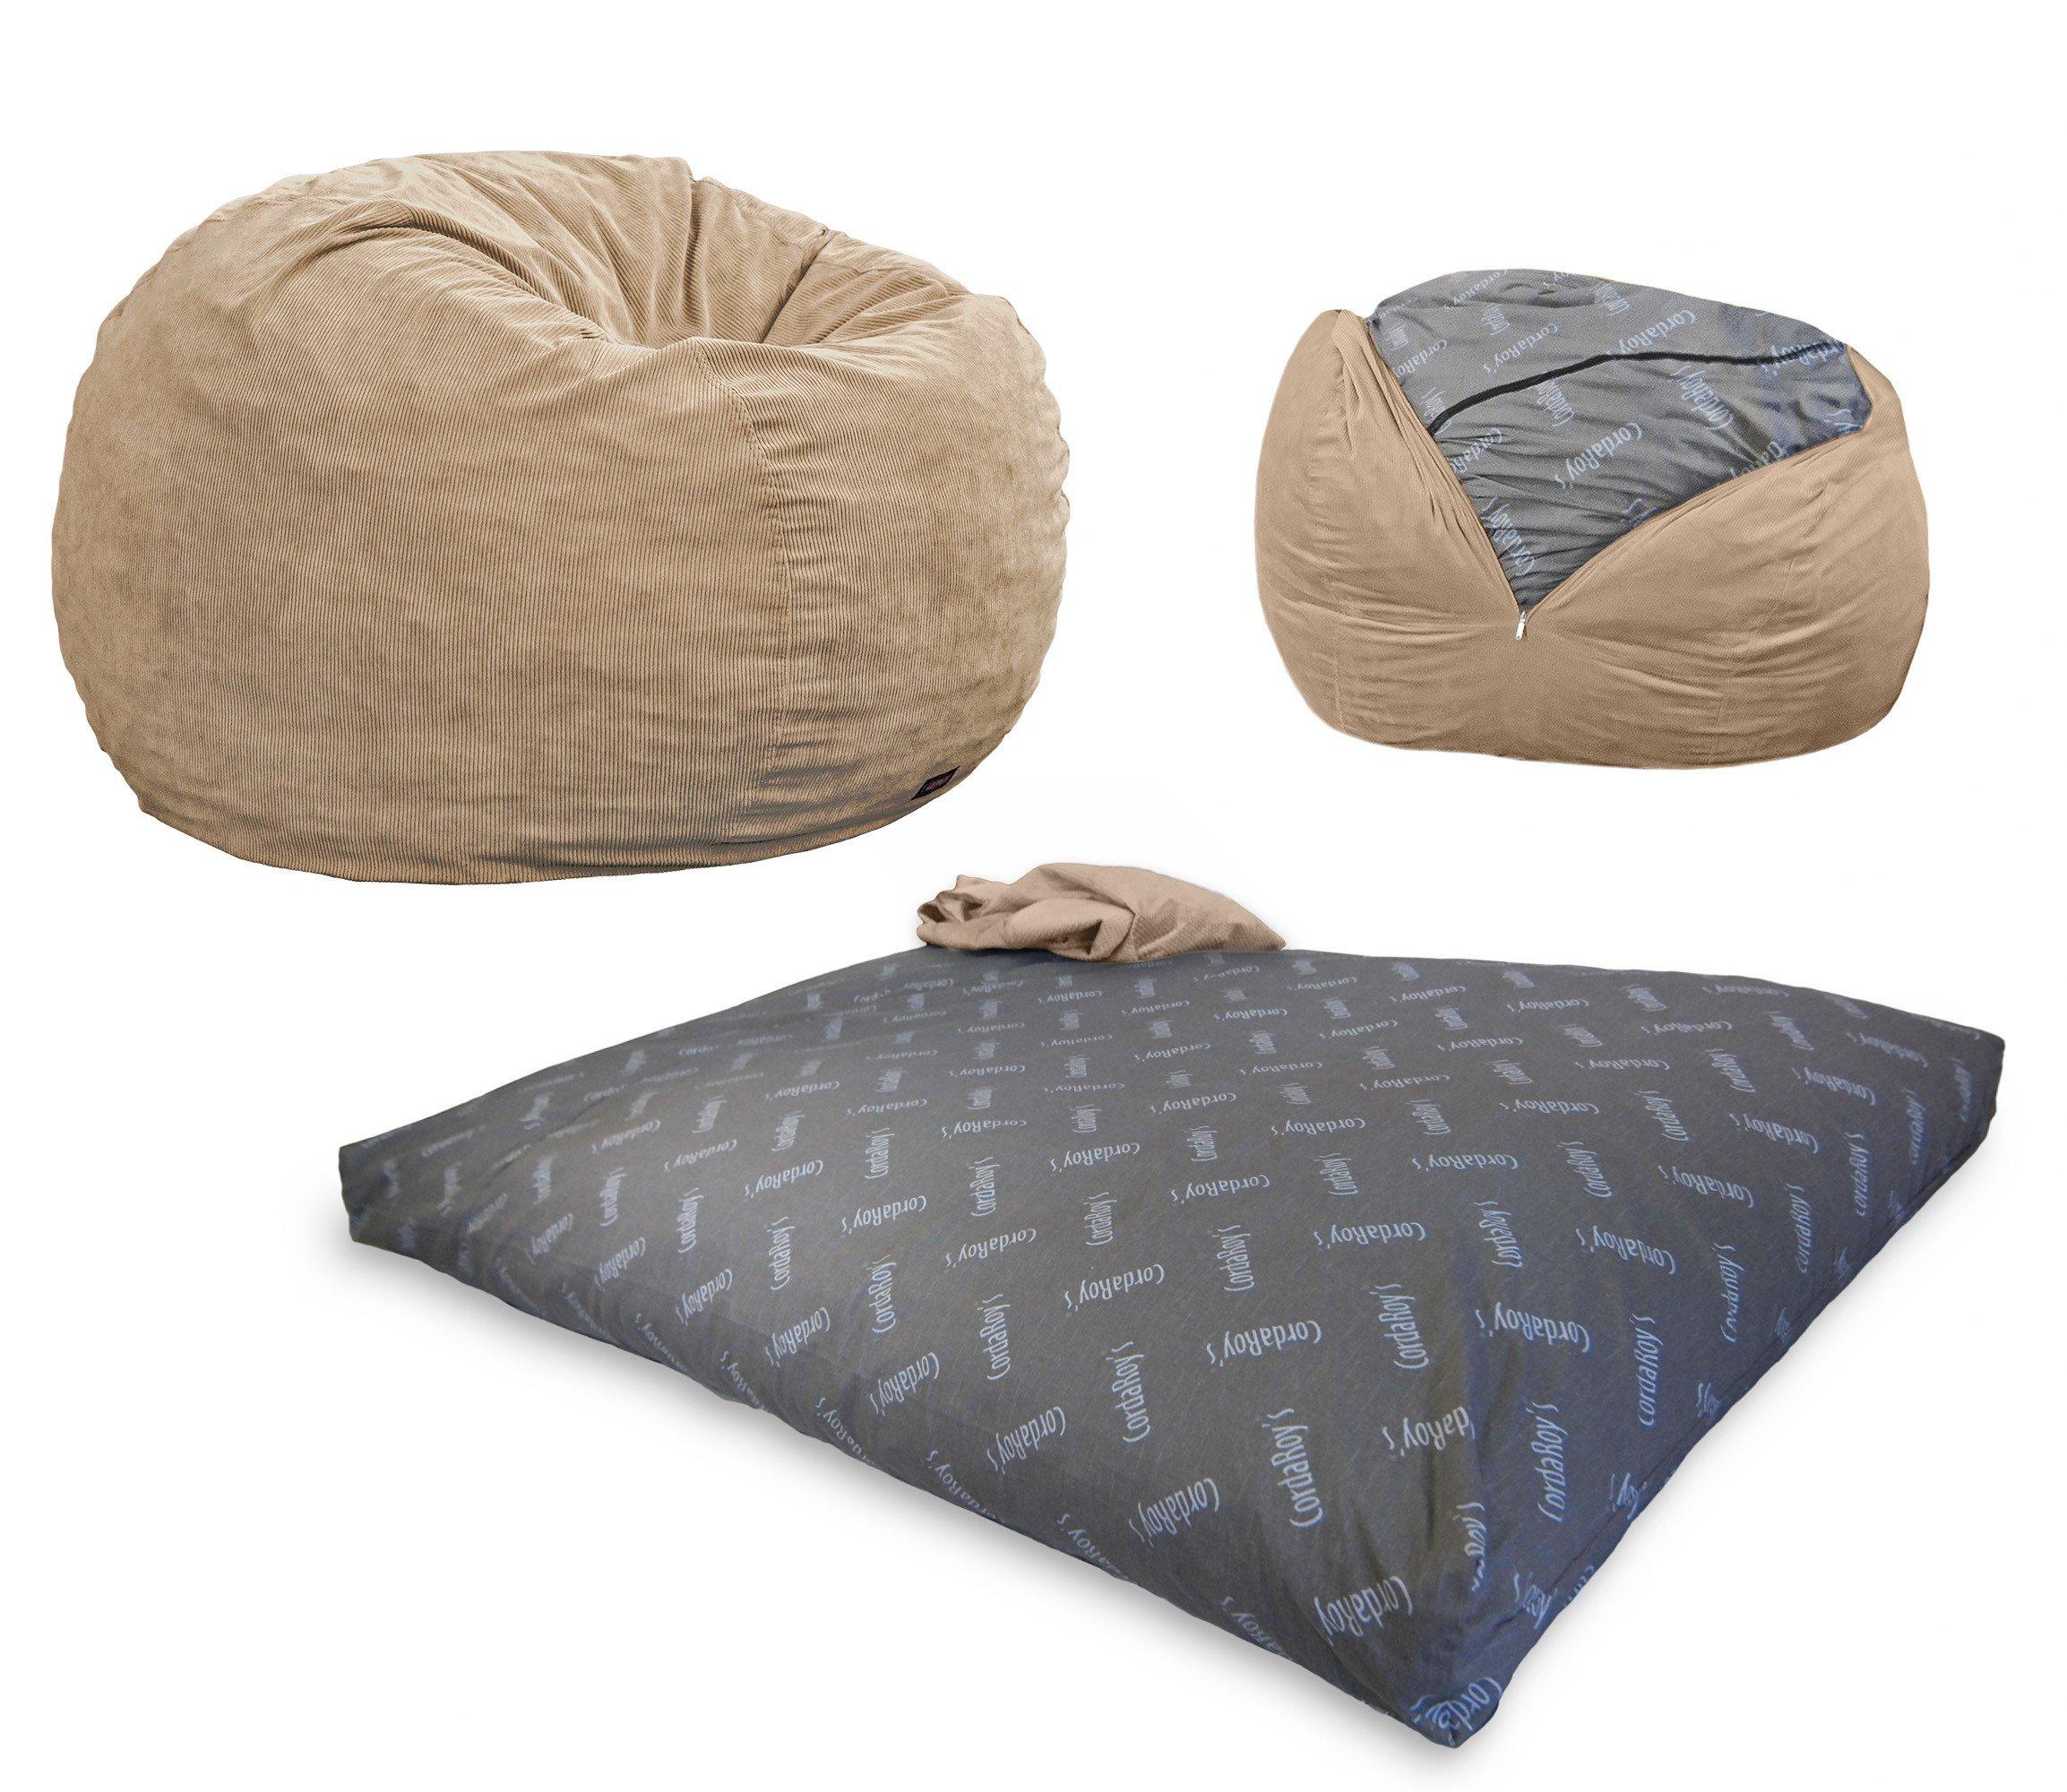 CordaRoy's - Khaki Corduroy Convertible Bean Bag Chair - Full by CordaRoy's